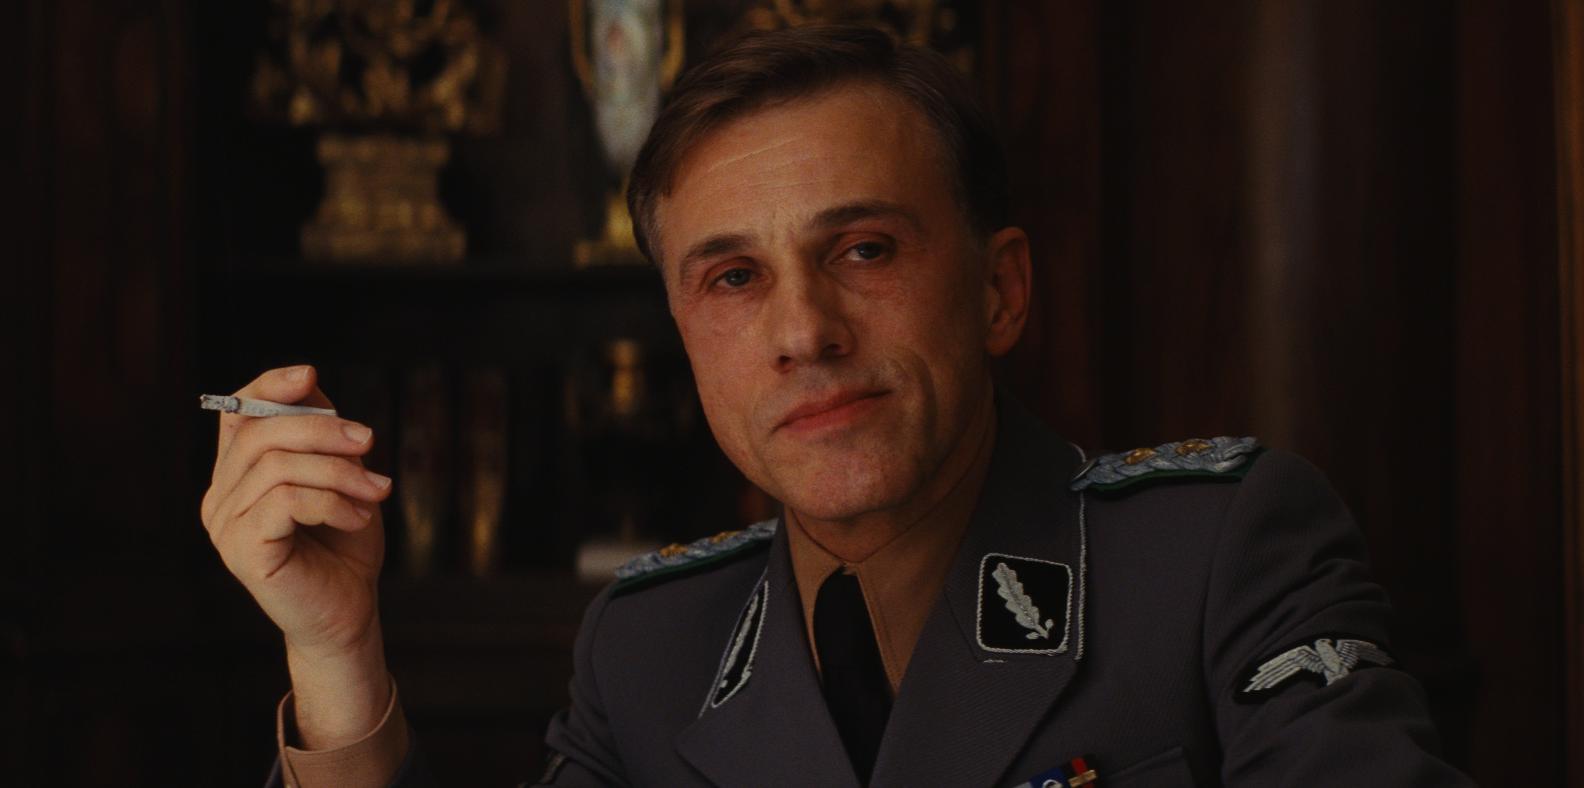 Hans Landa Christoph Waltz bastardi senza gloria Quentin tarantino cinematown.it